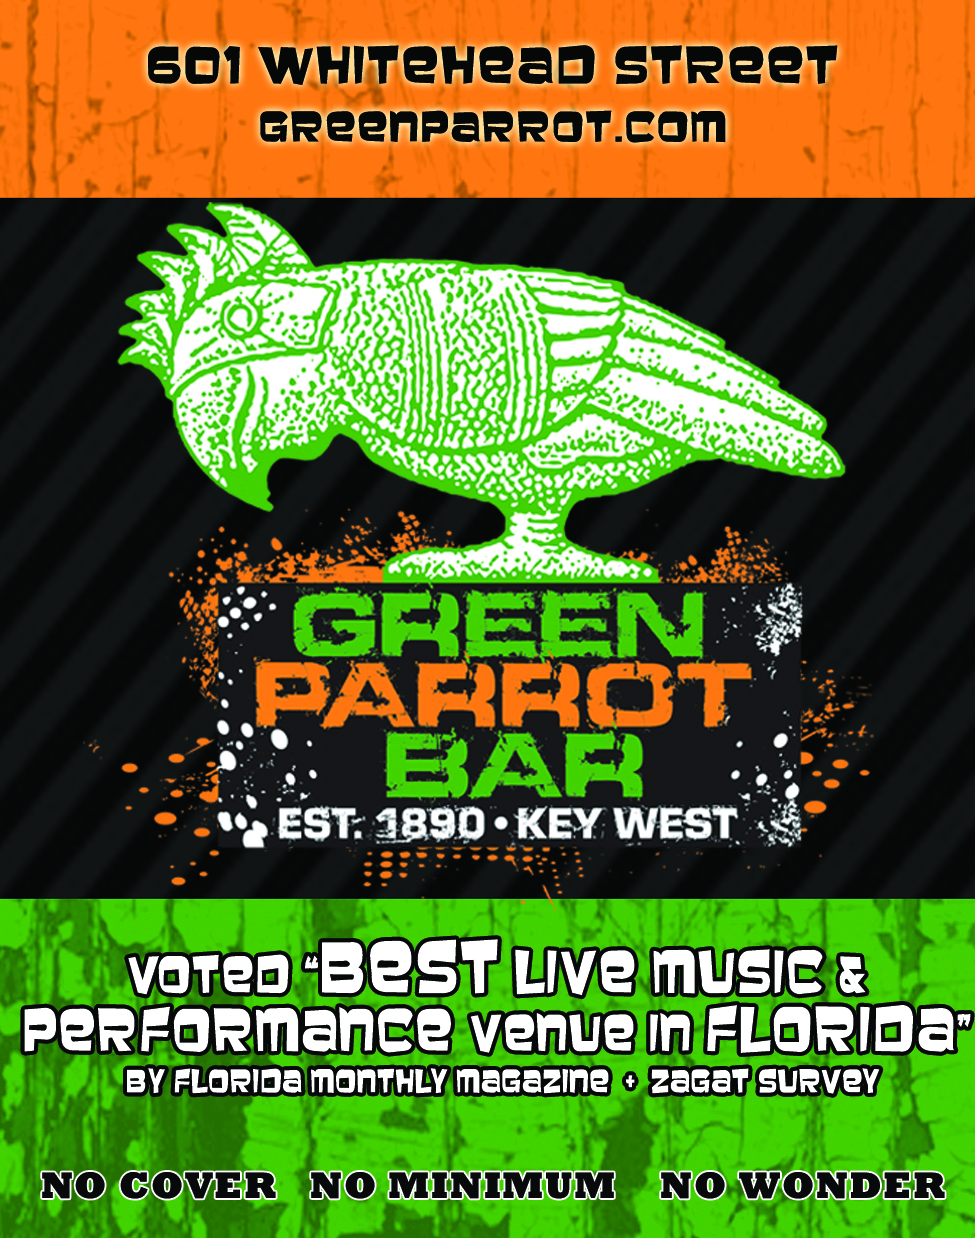 Green+Parrot+2014_TSKW-Ad_3.25x4.125.jpg